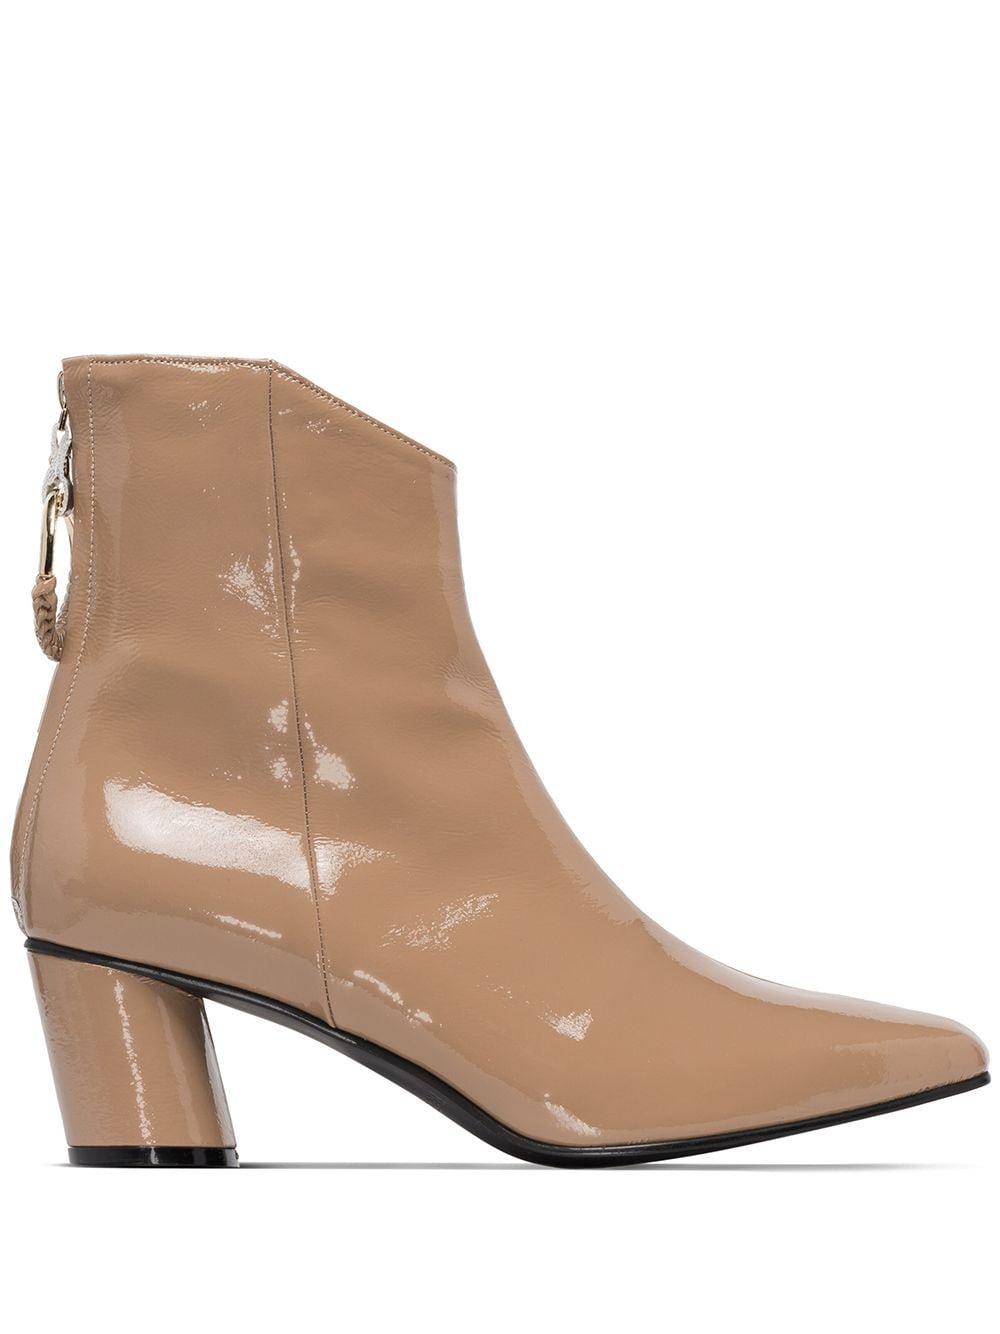 Reike Nen Patent 60mm Ankle Boots - Farfetch